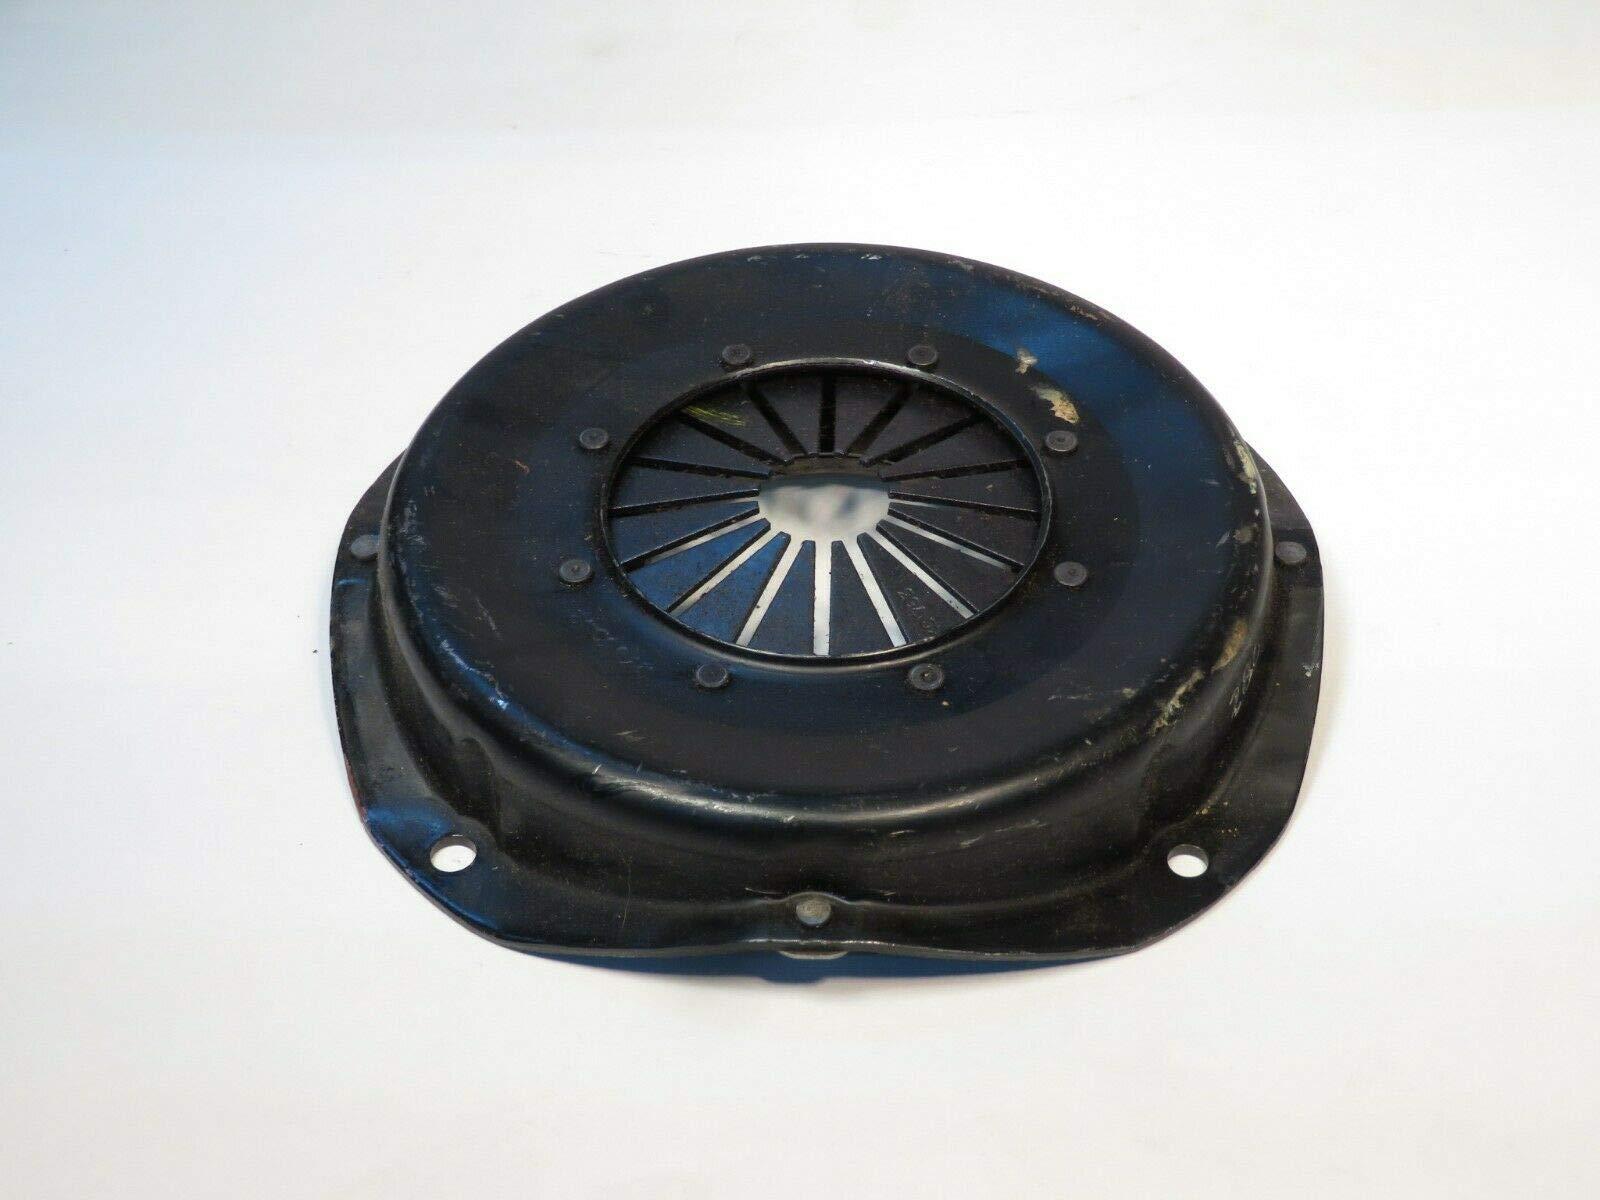 EPC Clutch Cover Pressure Plate 170mm QH Brand Fits Opel Kadett & GT1100 25-01202